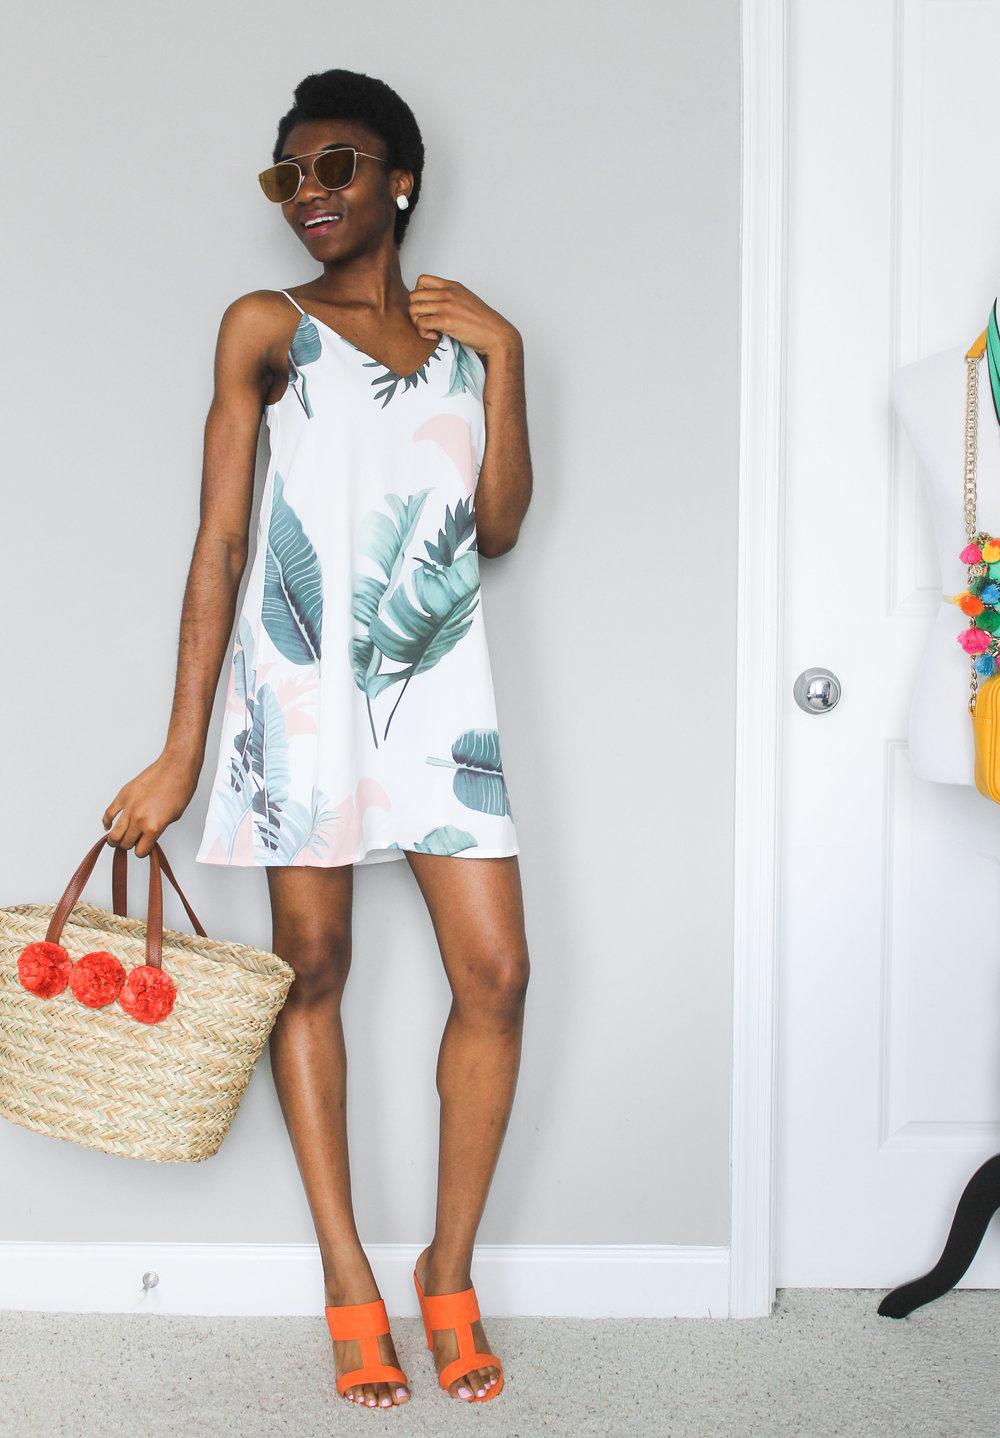 4WaystoWear-tropical-prints-dress 30.jpg